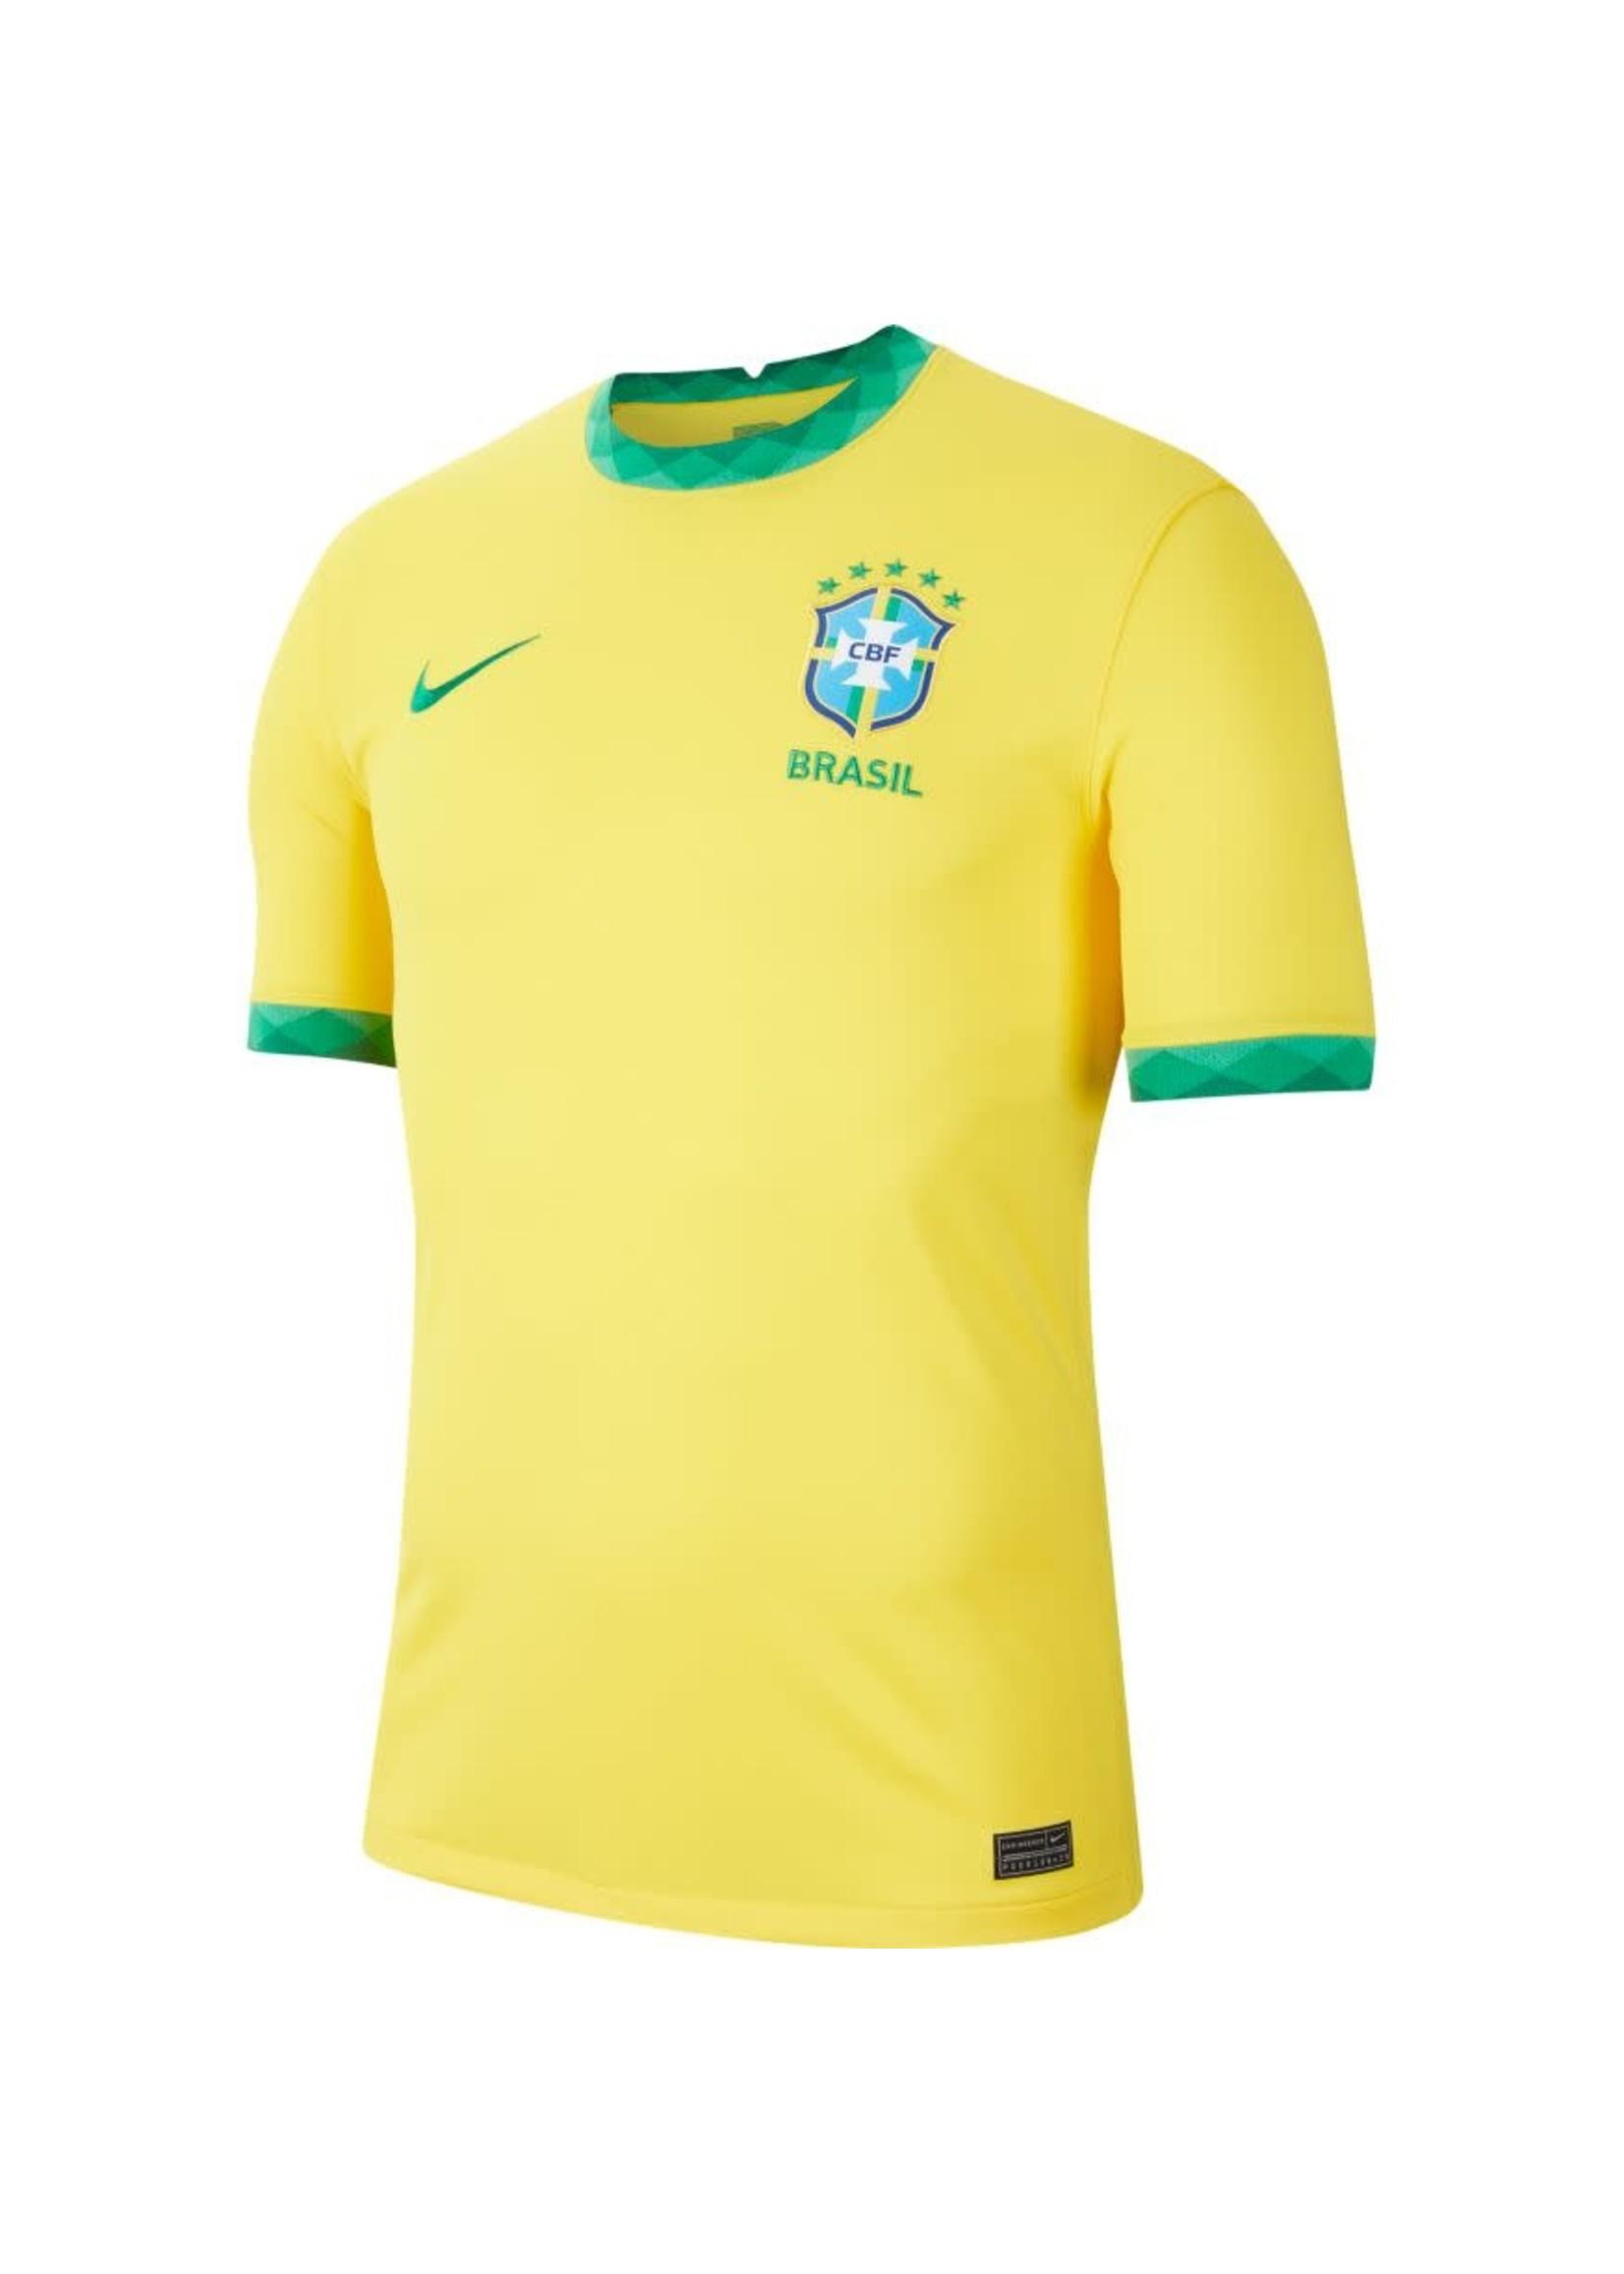 Nike Brazil 20/21 Home Jersey Adult